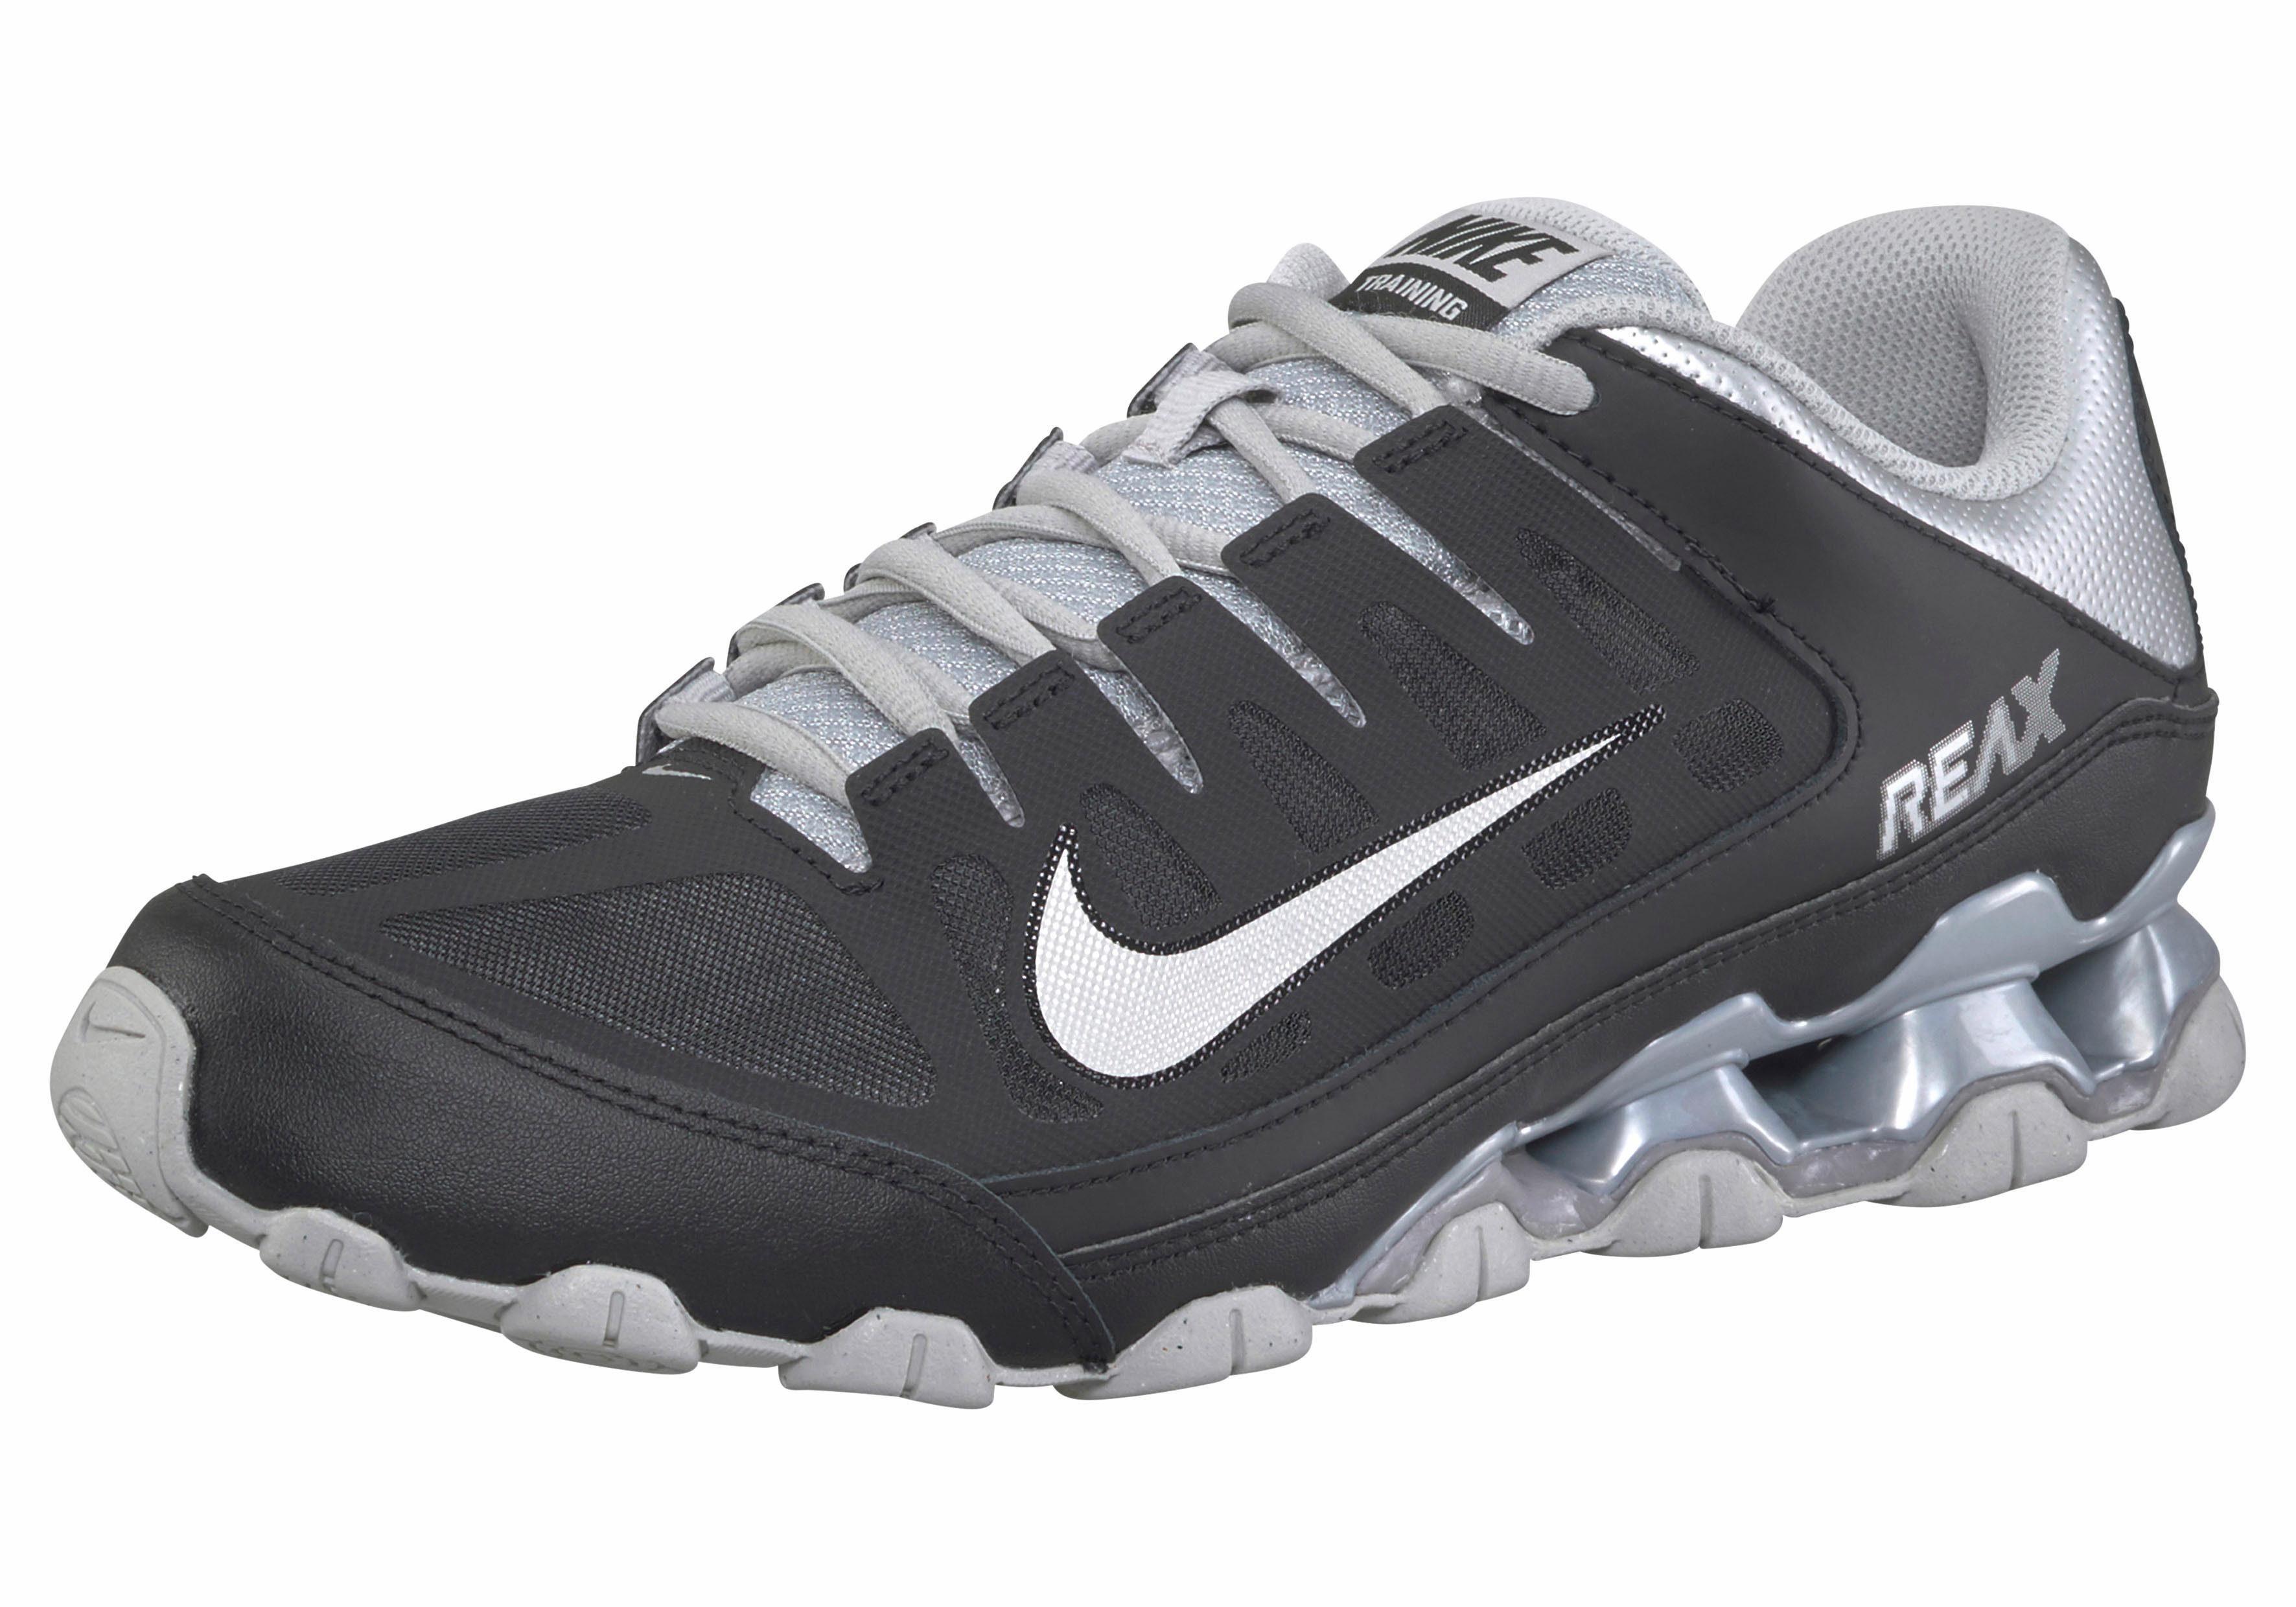 Nike »Reax 8 Tr Mesh« Trainingsschuh